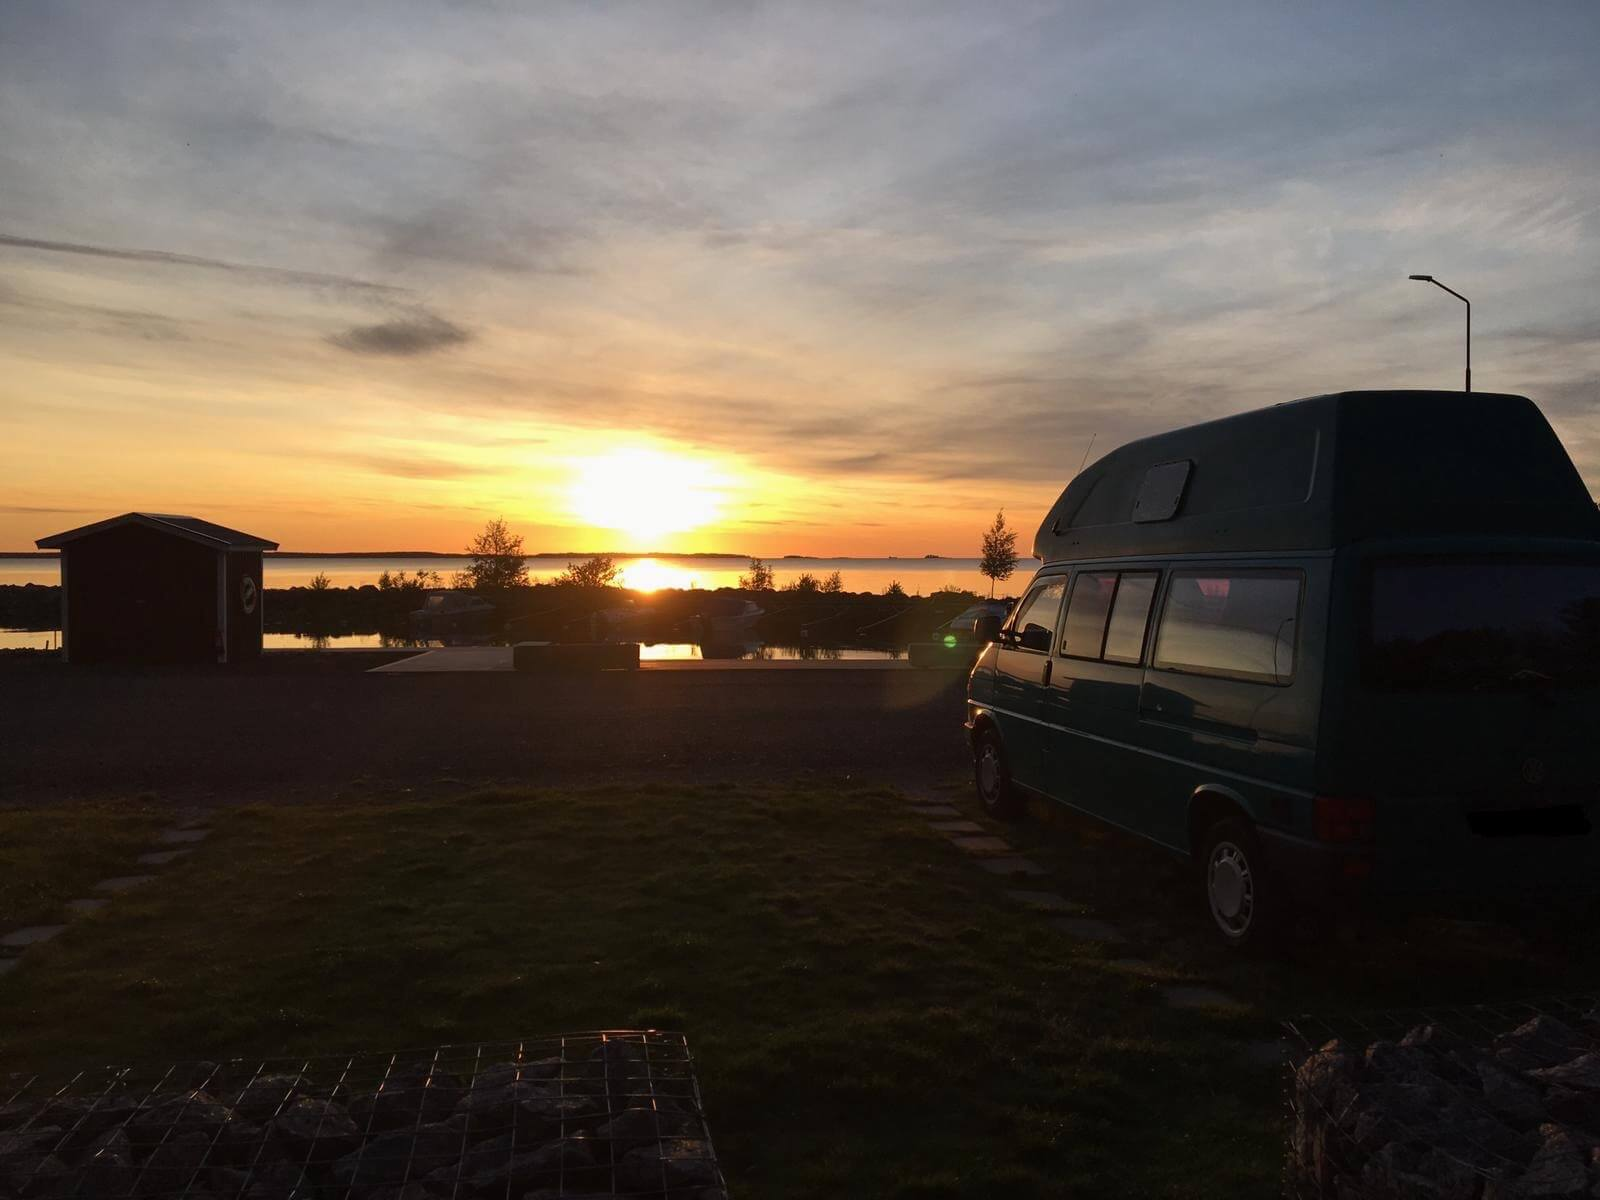 VW Bus T4 Manfred California gruen Camper Bulli mieten Rostock bincampen Sonnenuntergang Sommer